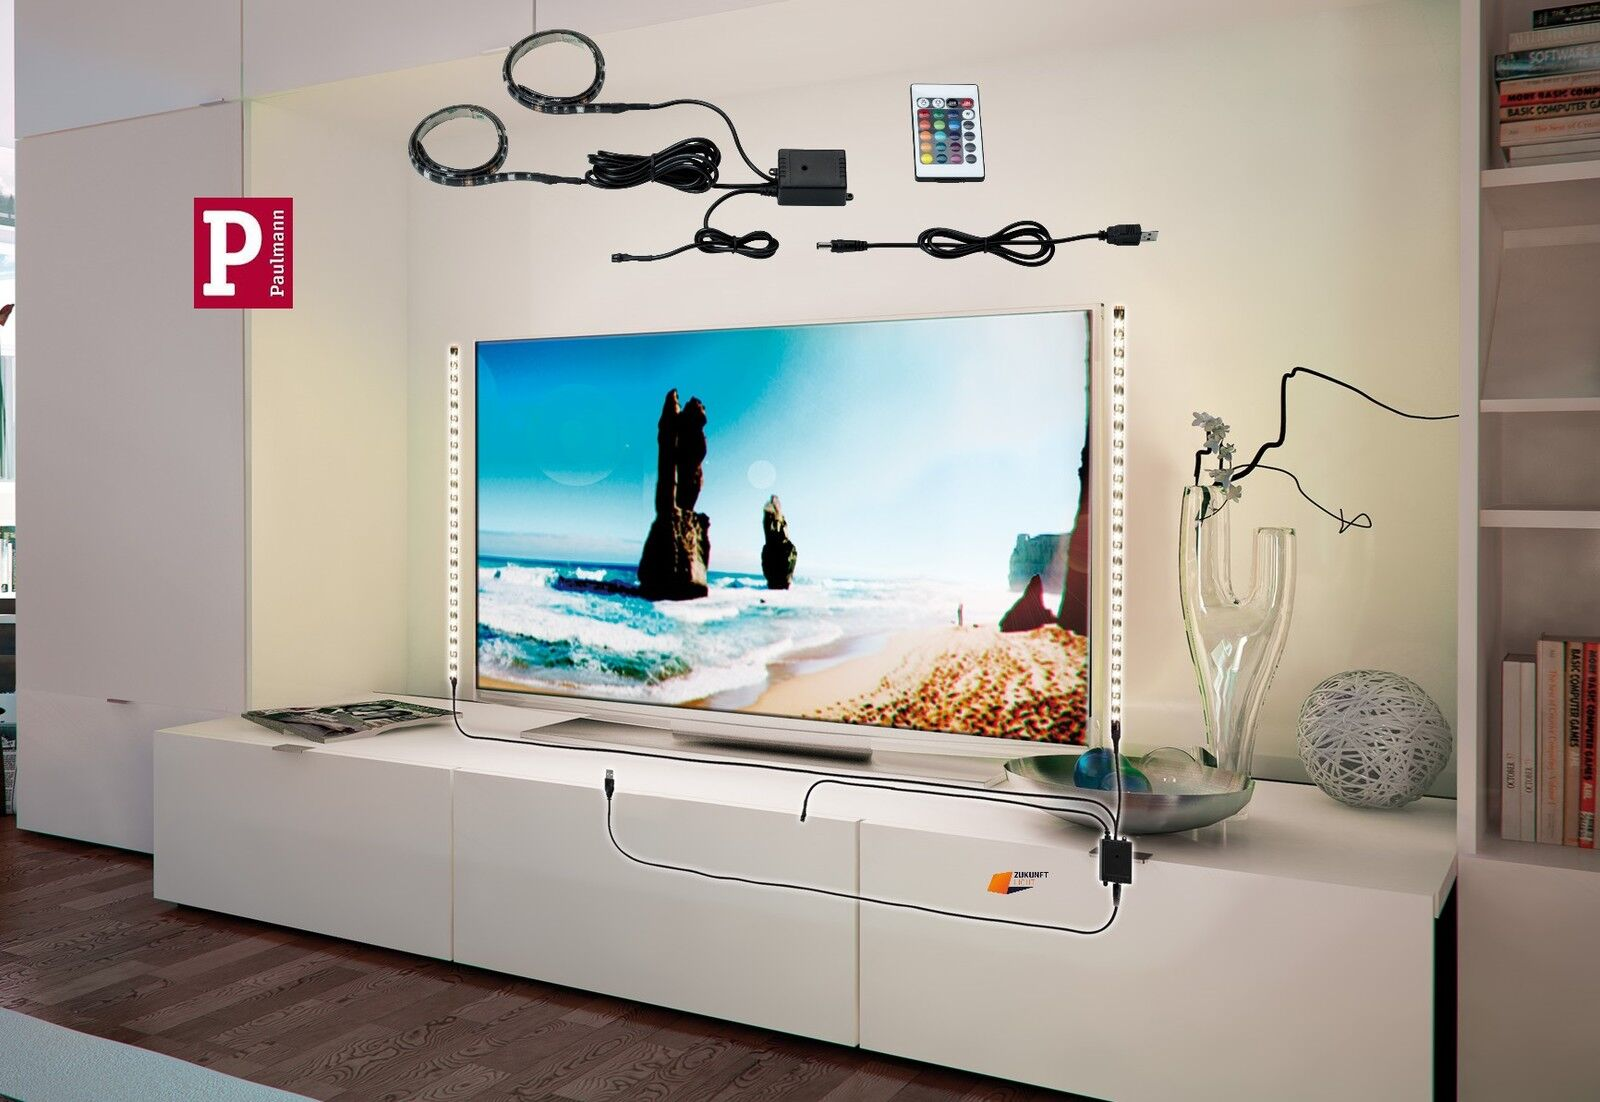 Paulmann led strips rgb mit usb anschluss f r tv hifi - Wandhalterung fur tv gerate ...